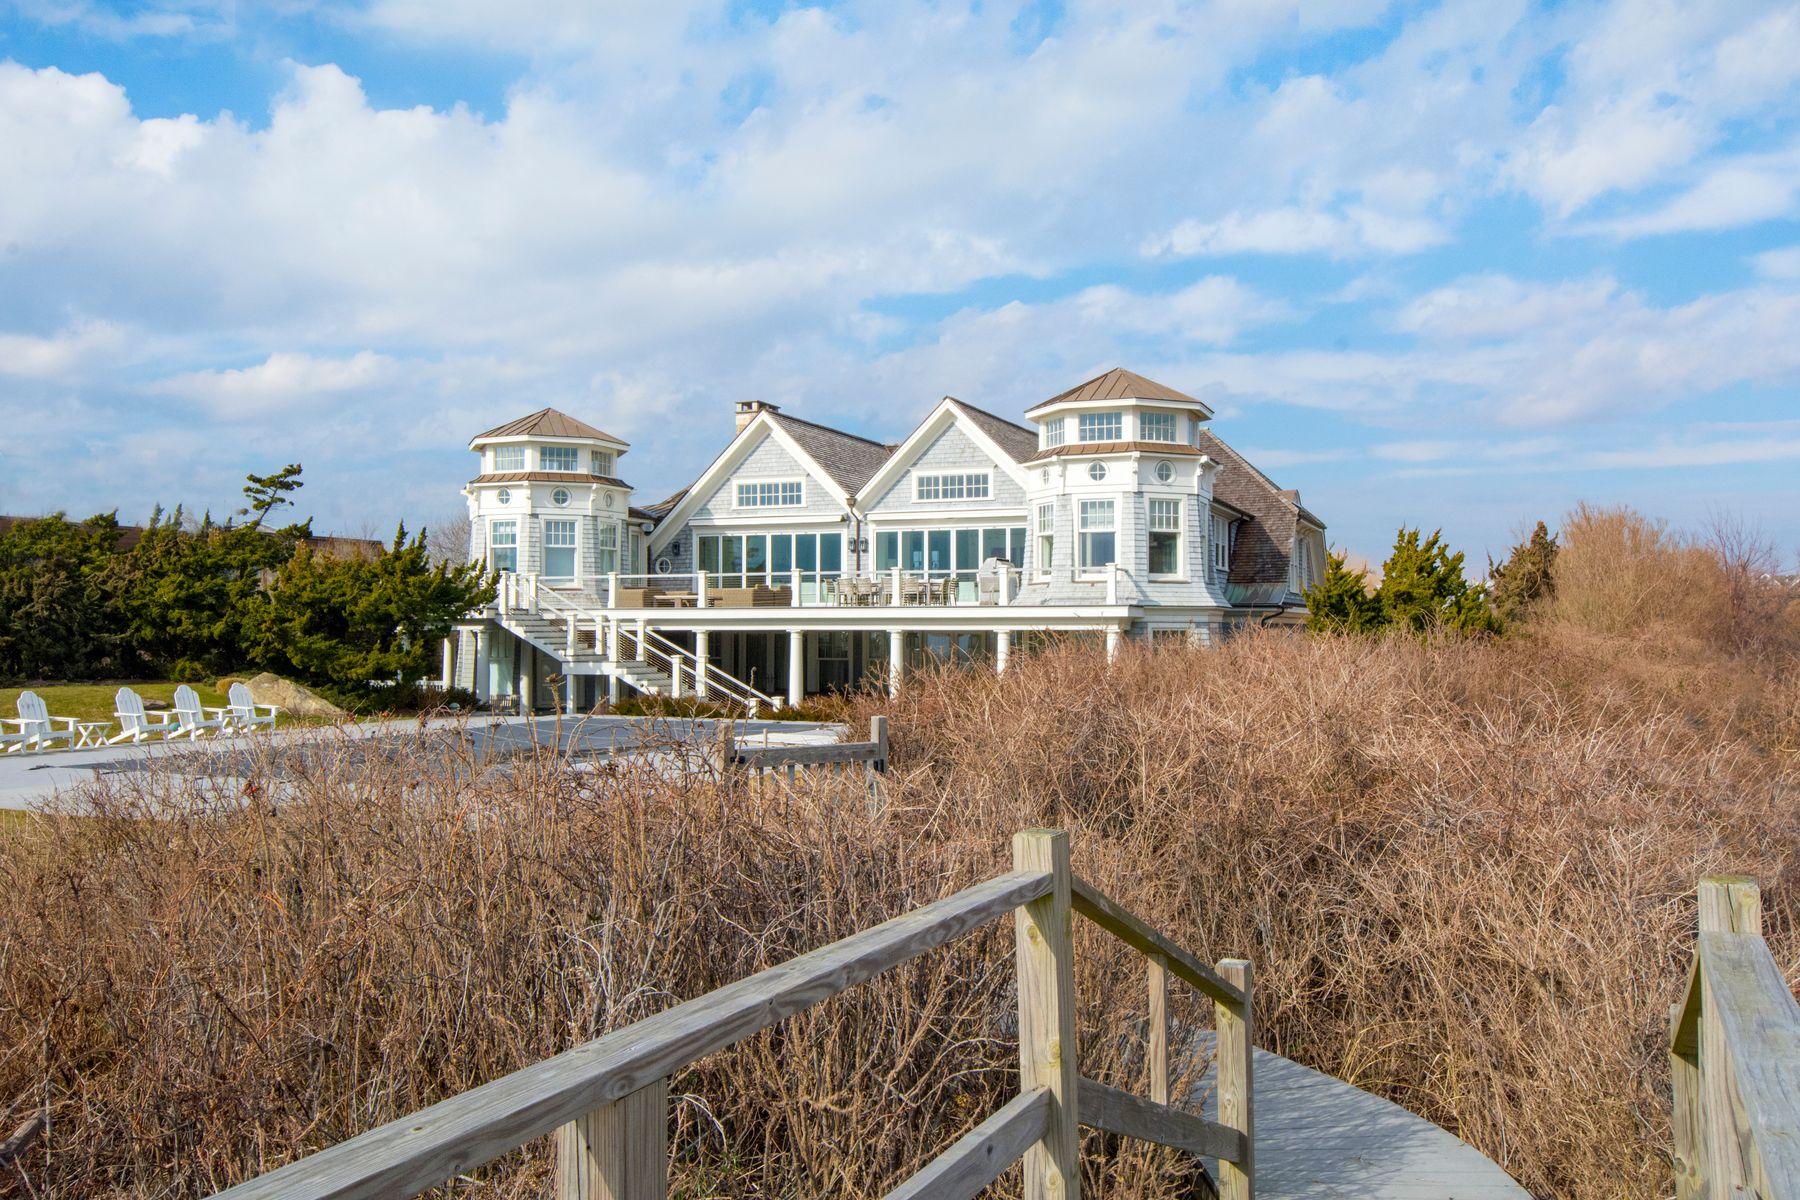 Single Family Home for Rent at Bridgehampton Oceanfront 205 Surfside Drive Bridgehampton, New York 11932 United States